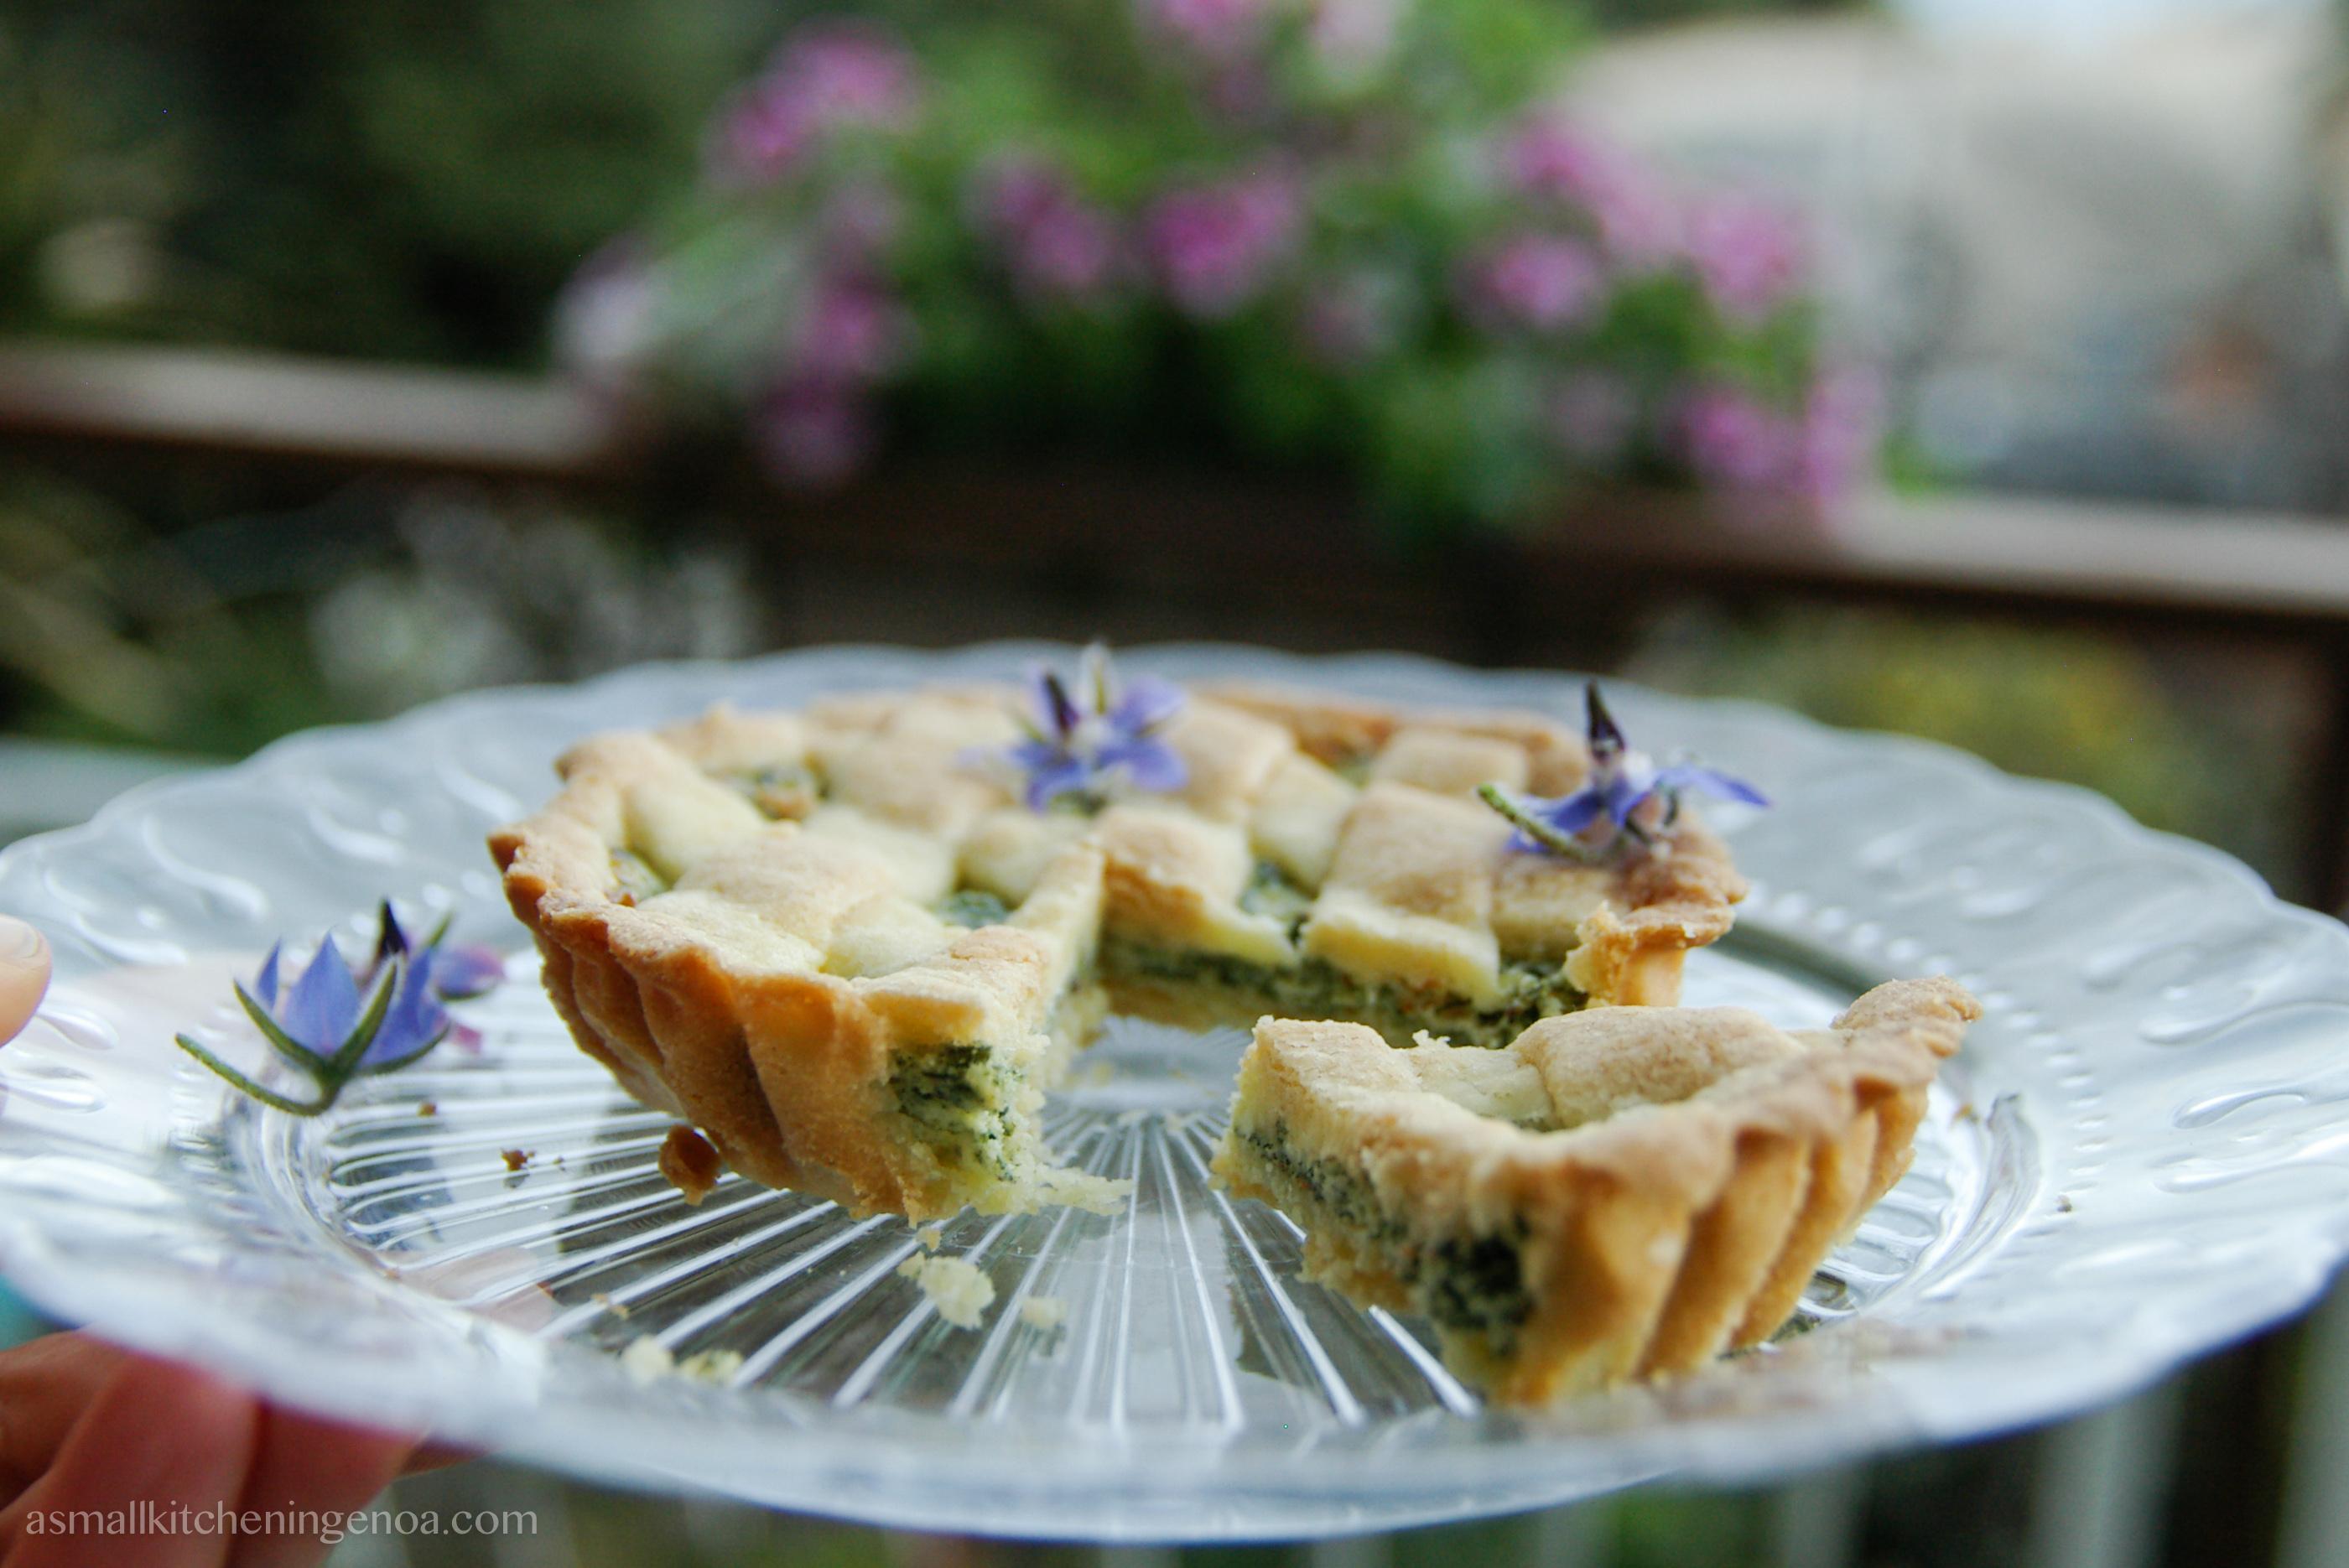 borages tartlets: shortcrust pastry, ricotta cheese, borages, orange peel and cinnamon